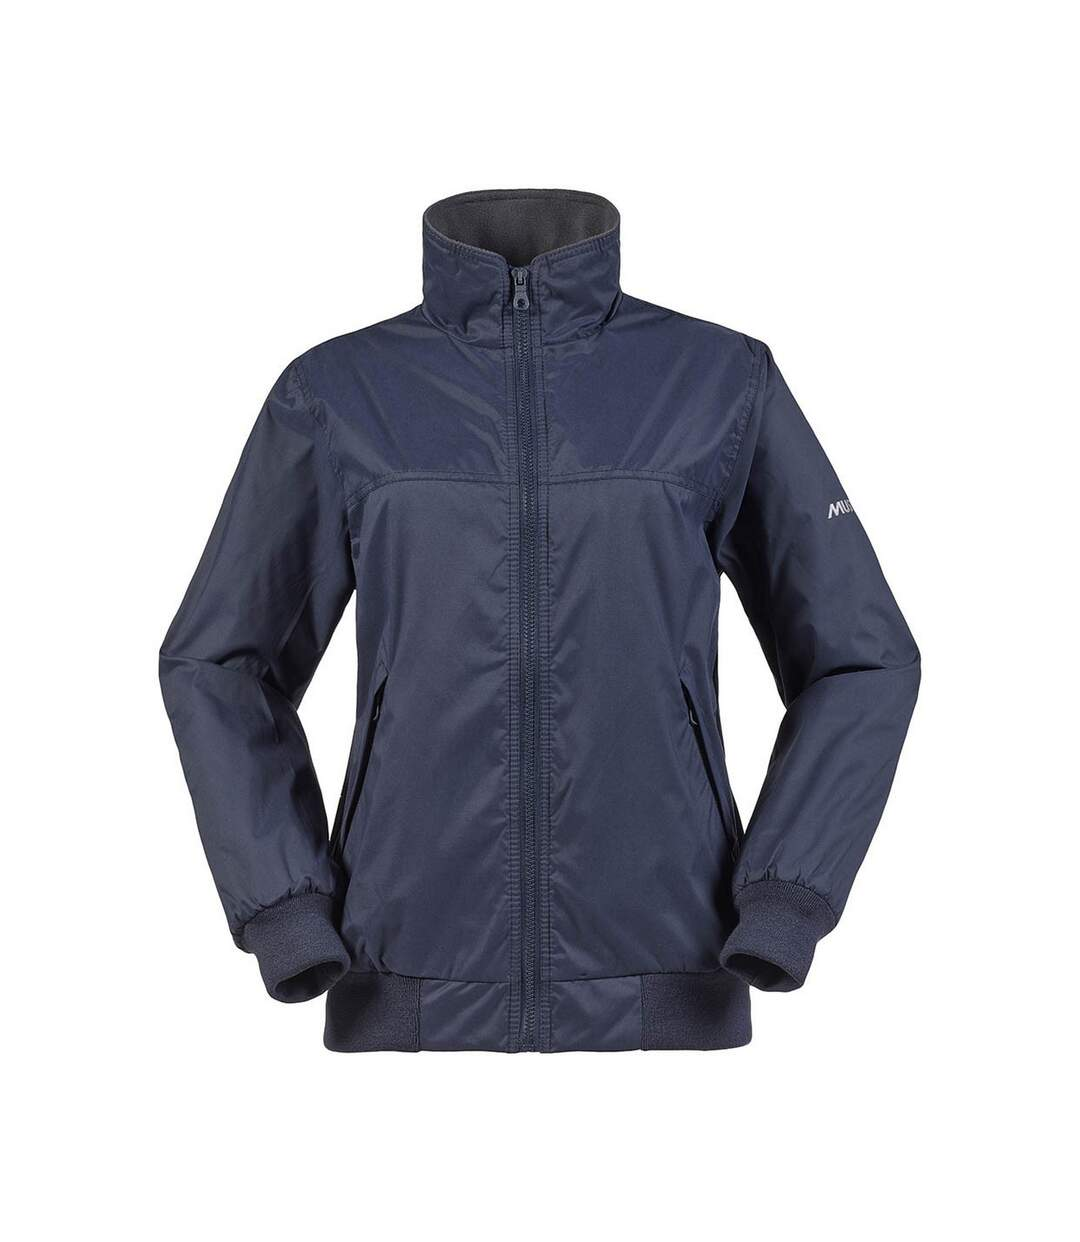 Musto Mens Snug Blouson II Showerproof Jacket (True Navy/True Red) - UTRW5600